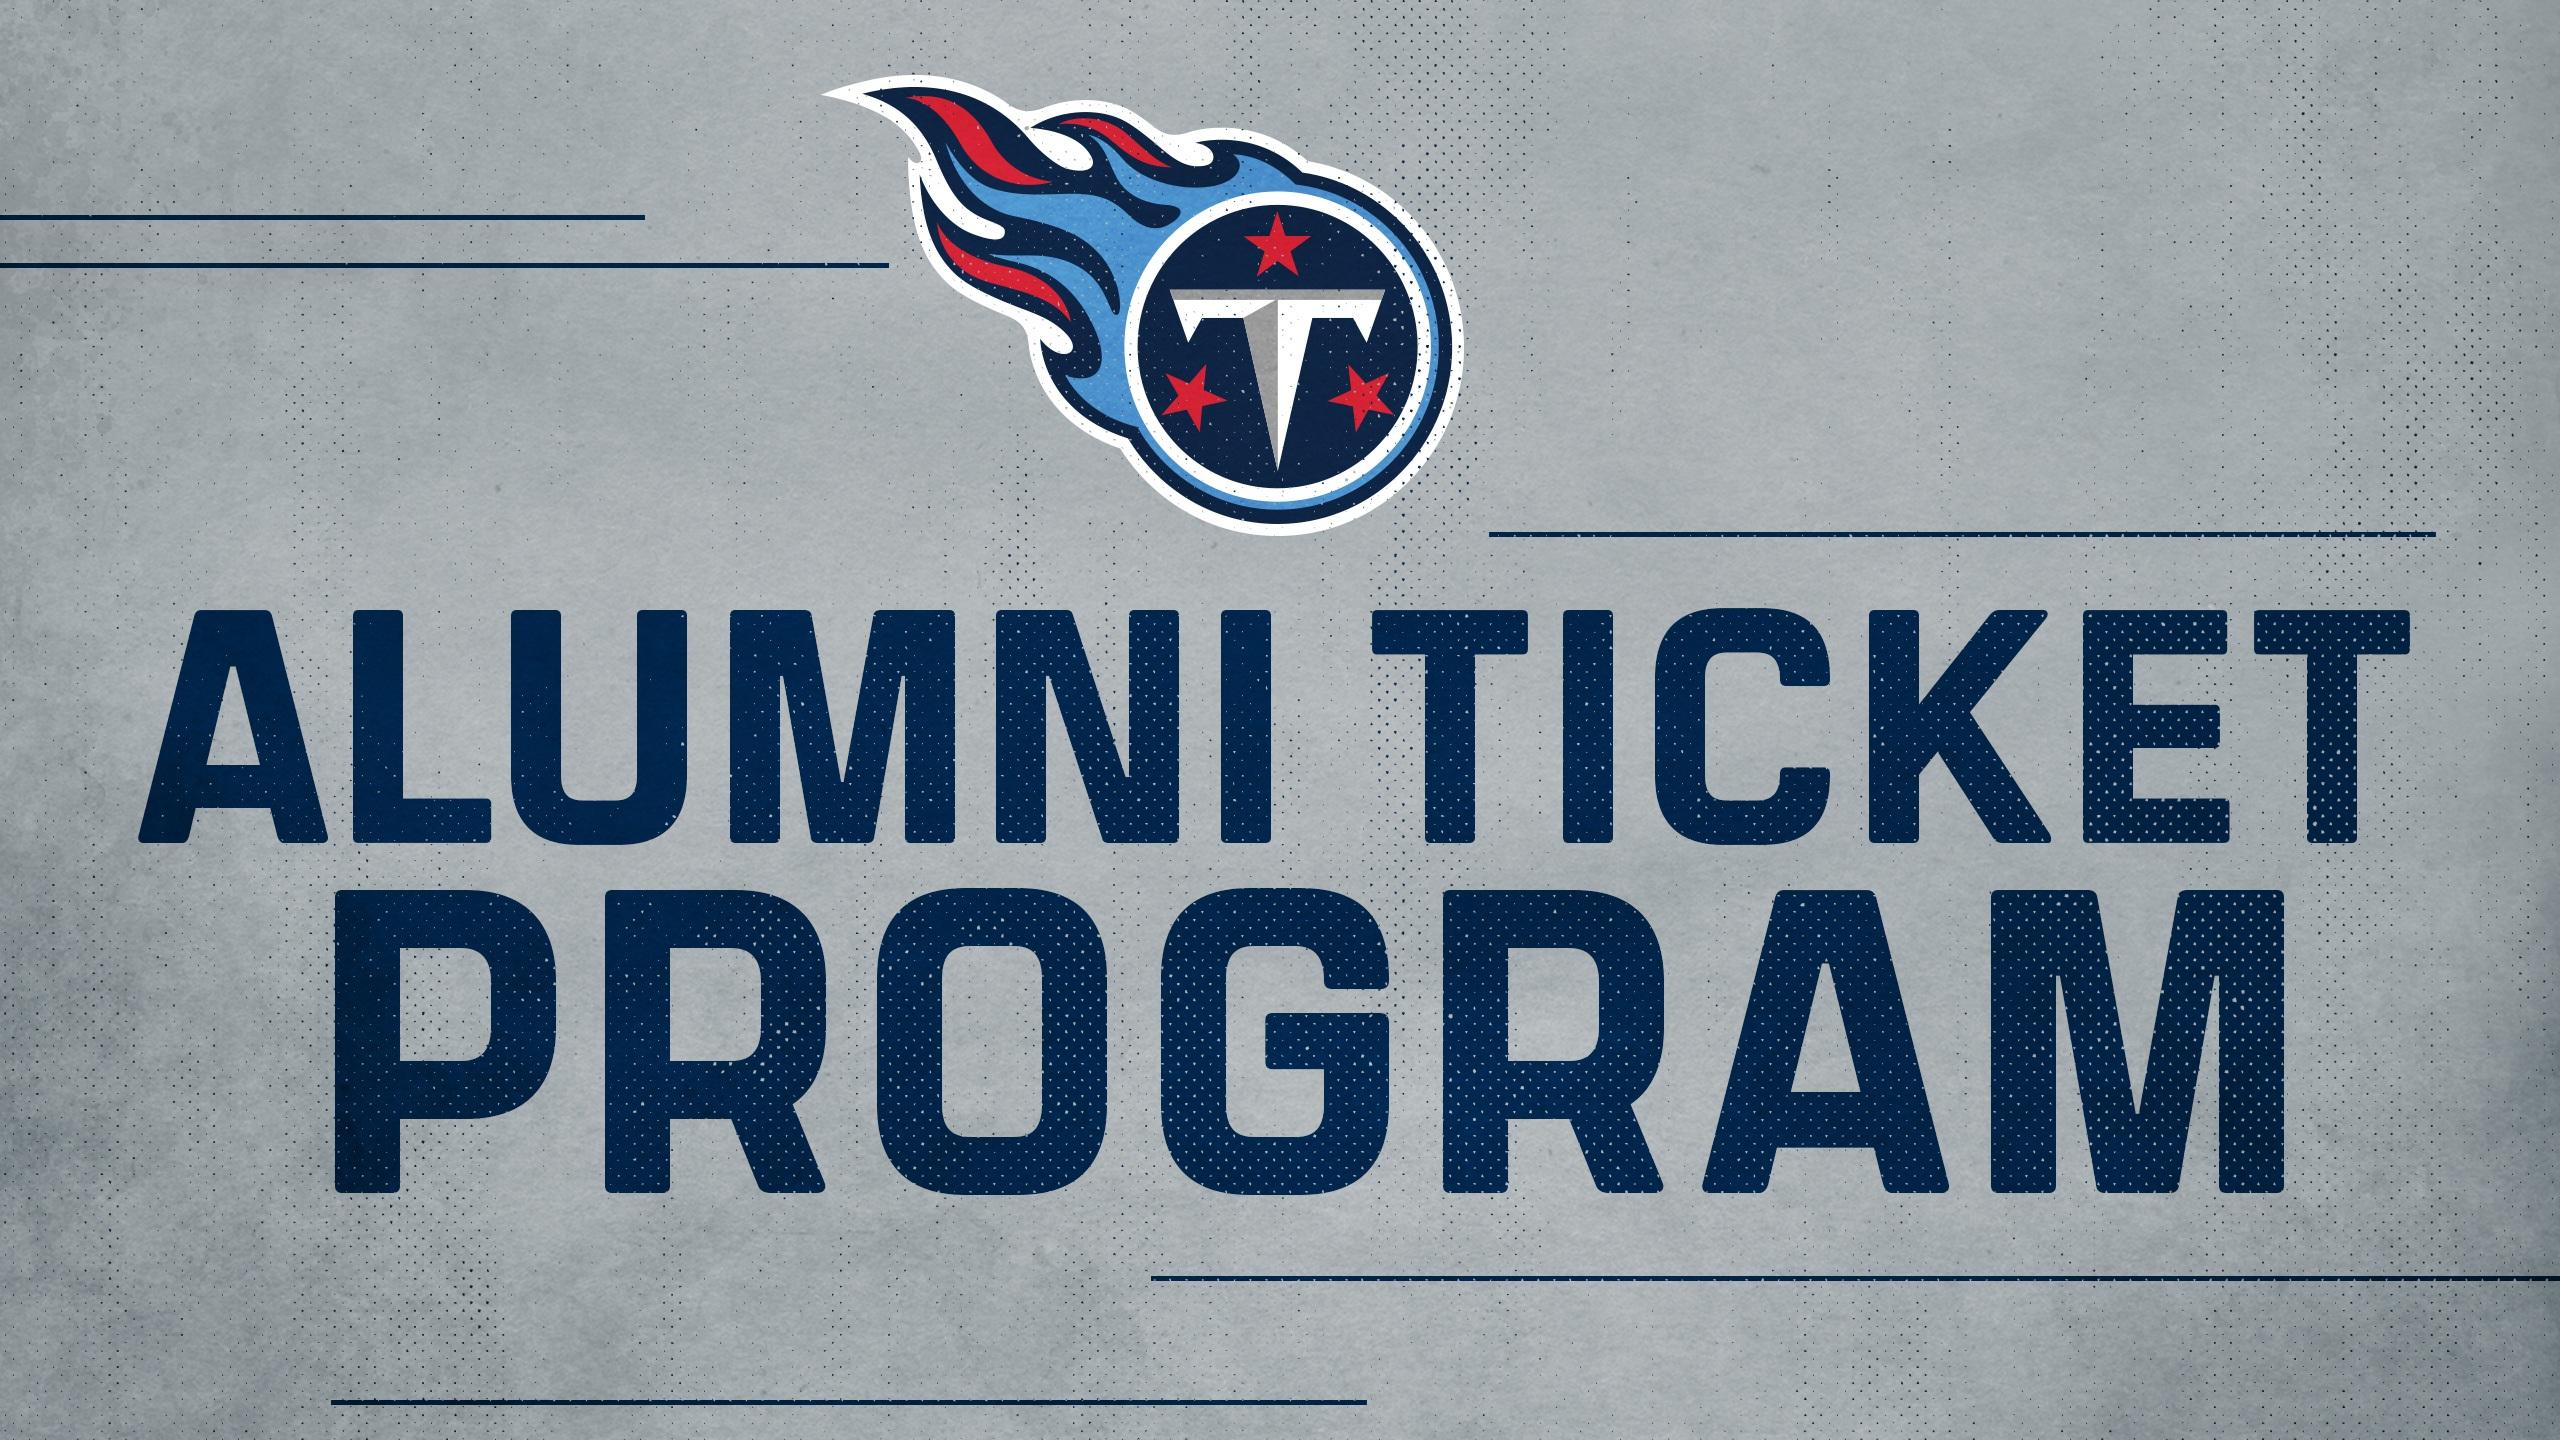 Titans Alumni Ticket Program